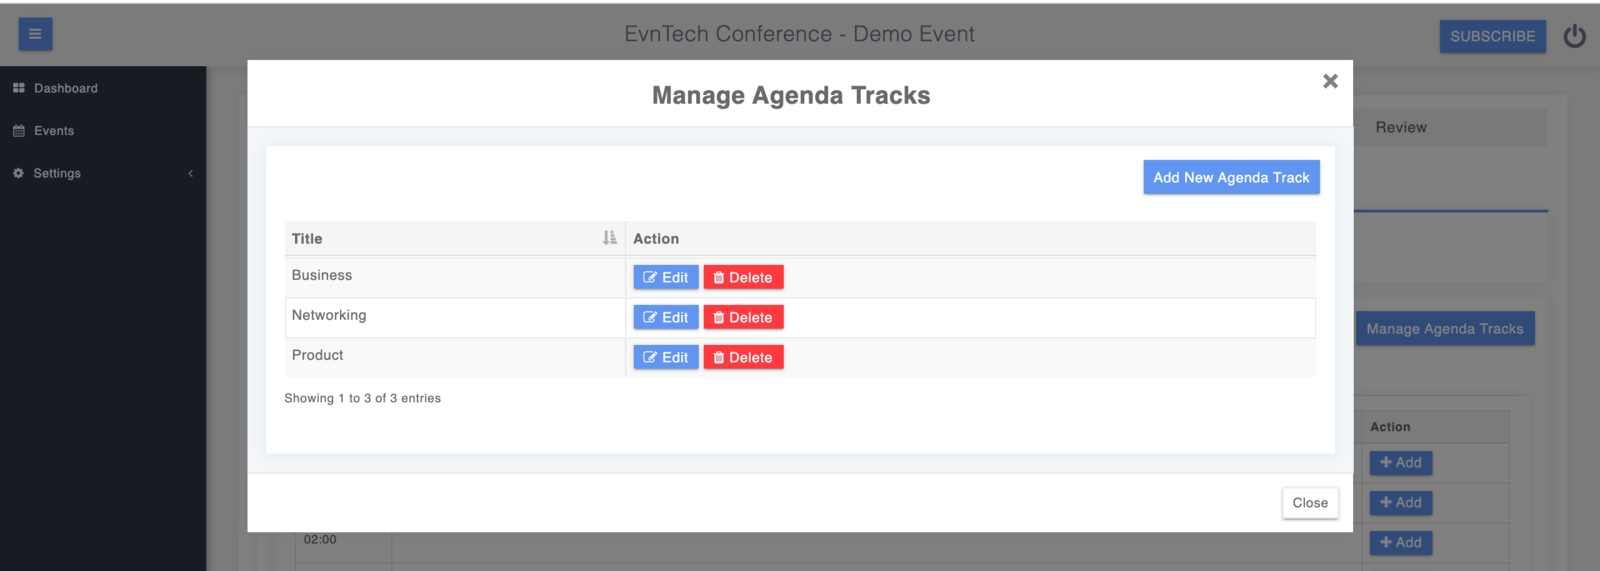 Edit/Manage Tracks